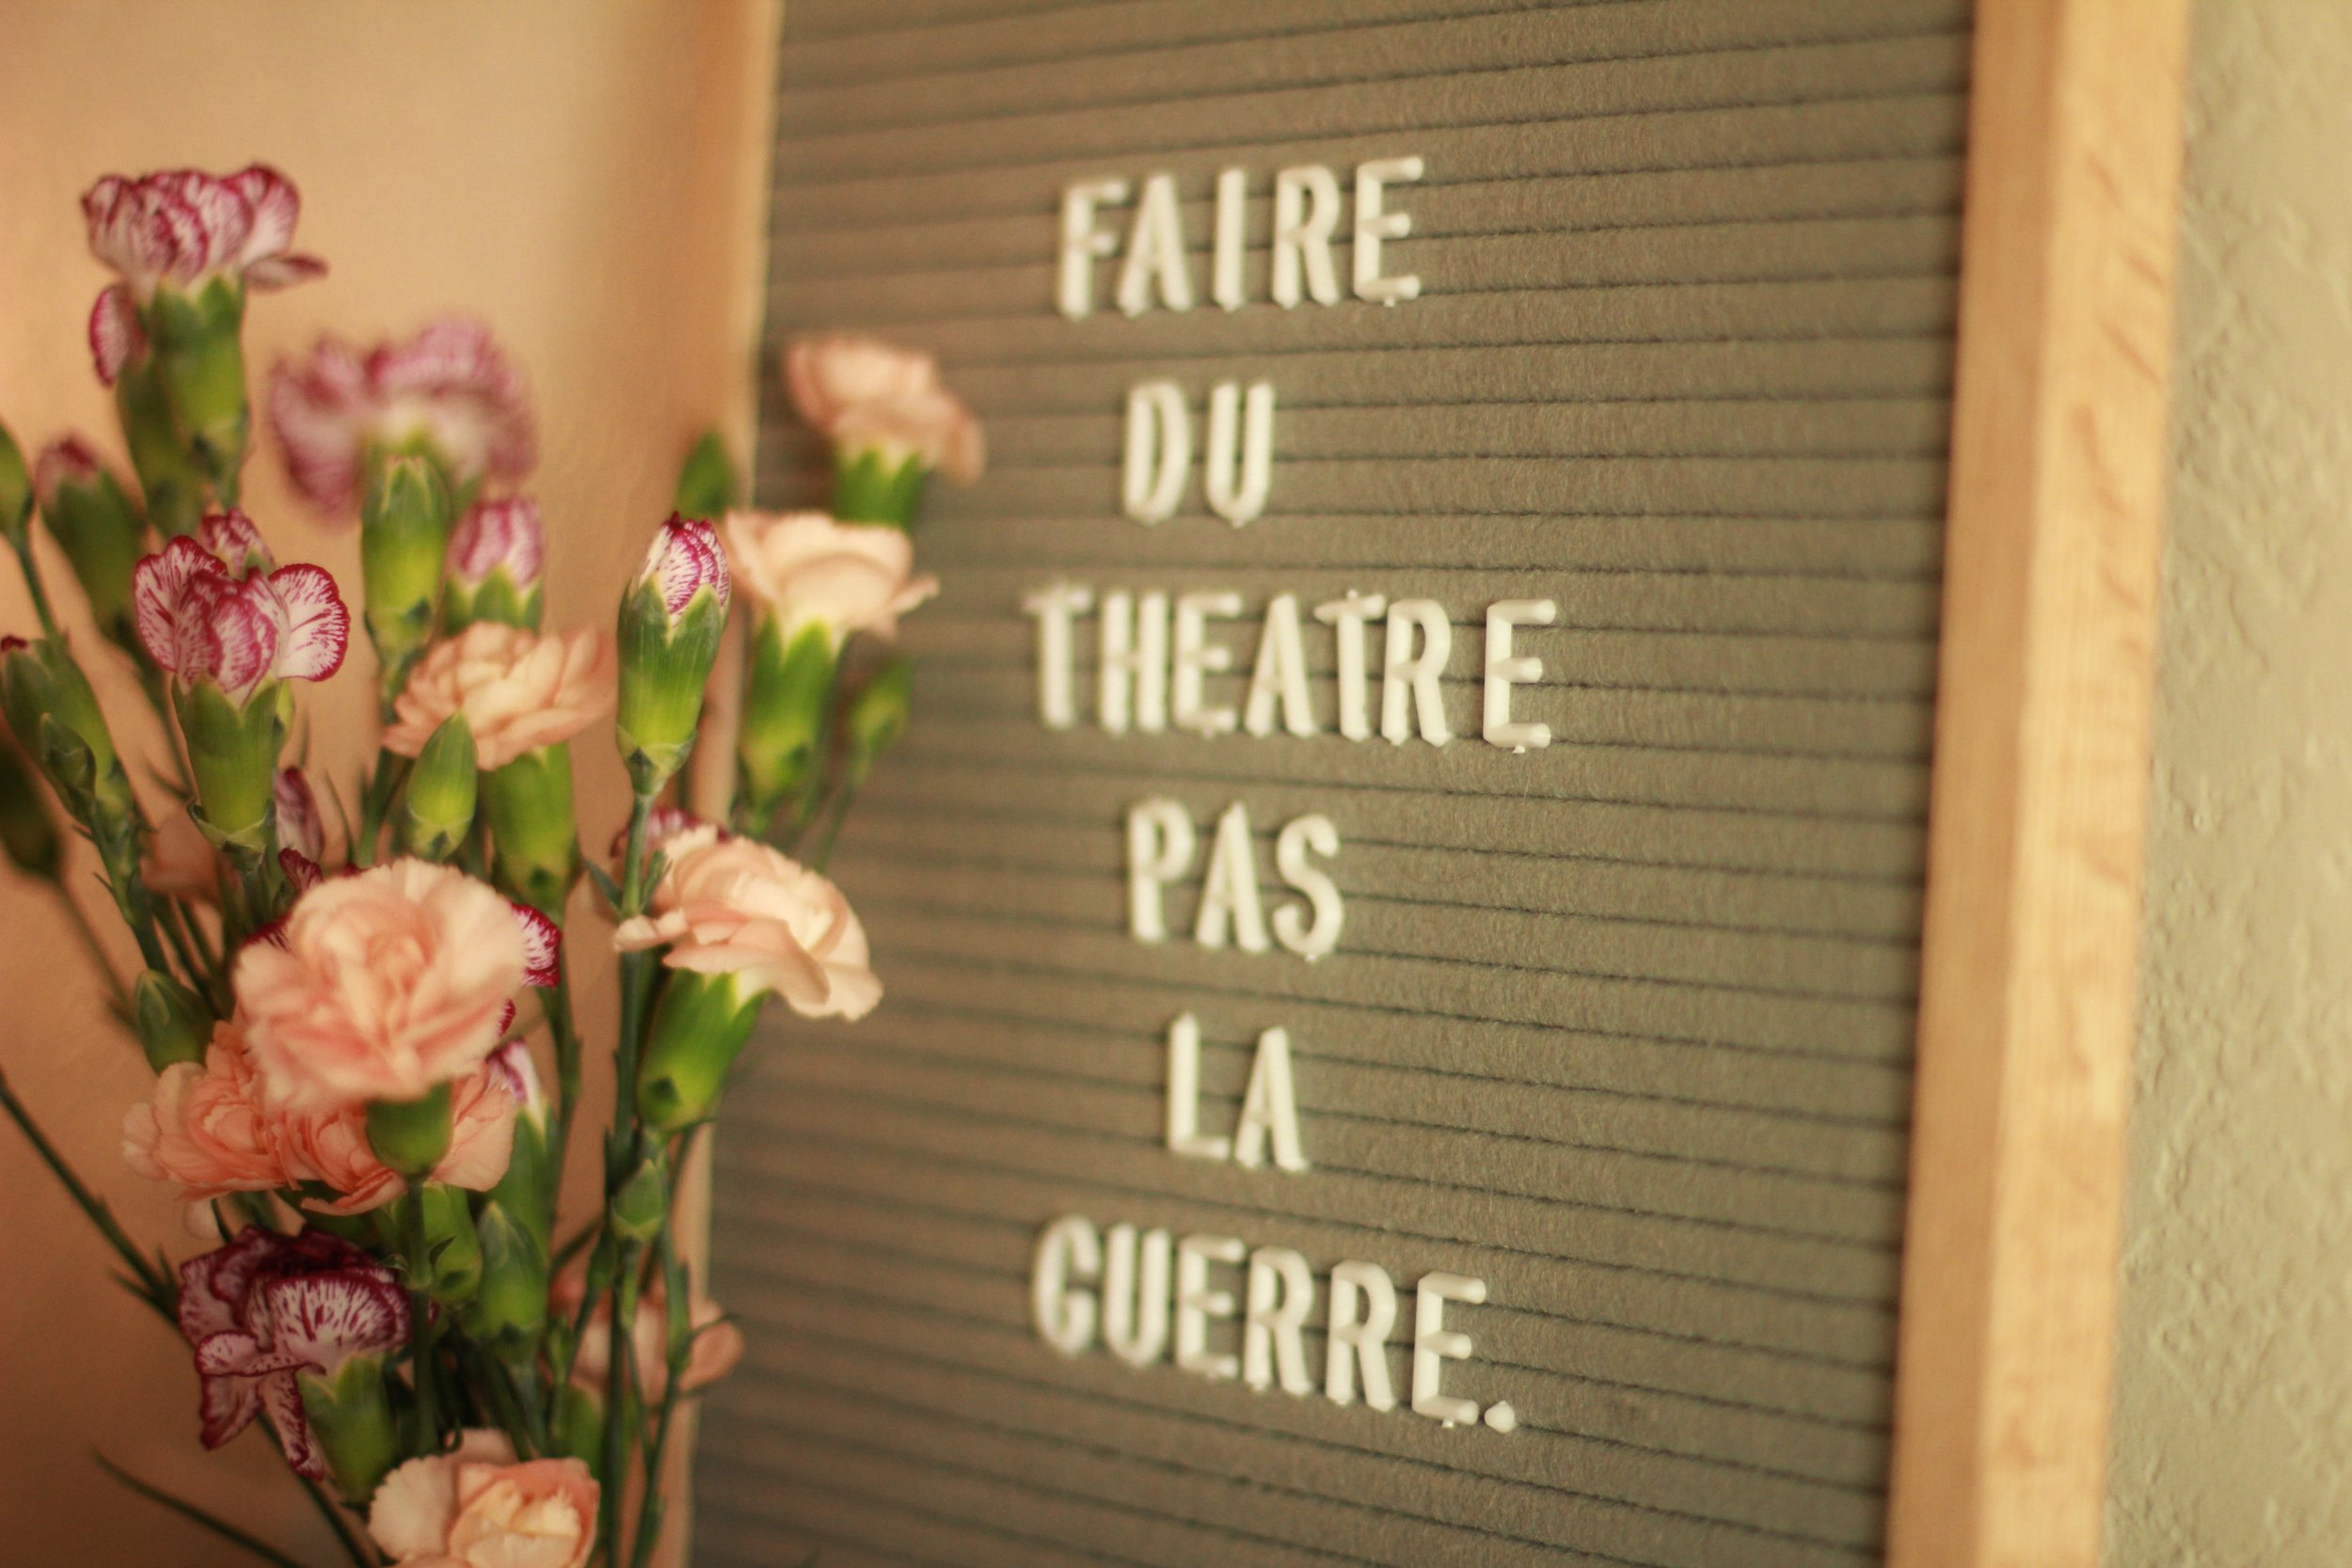 faire.du.theatre_seekwelfare